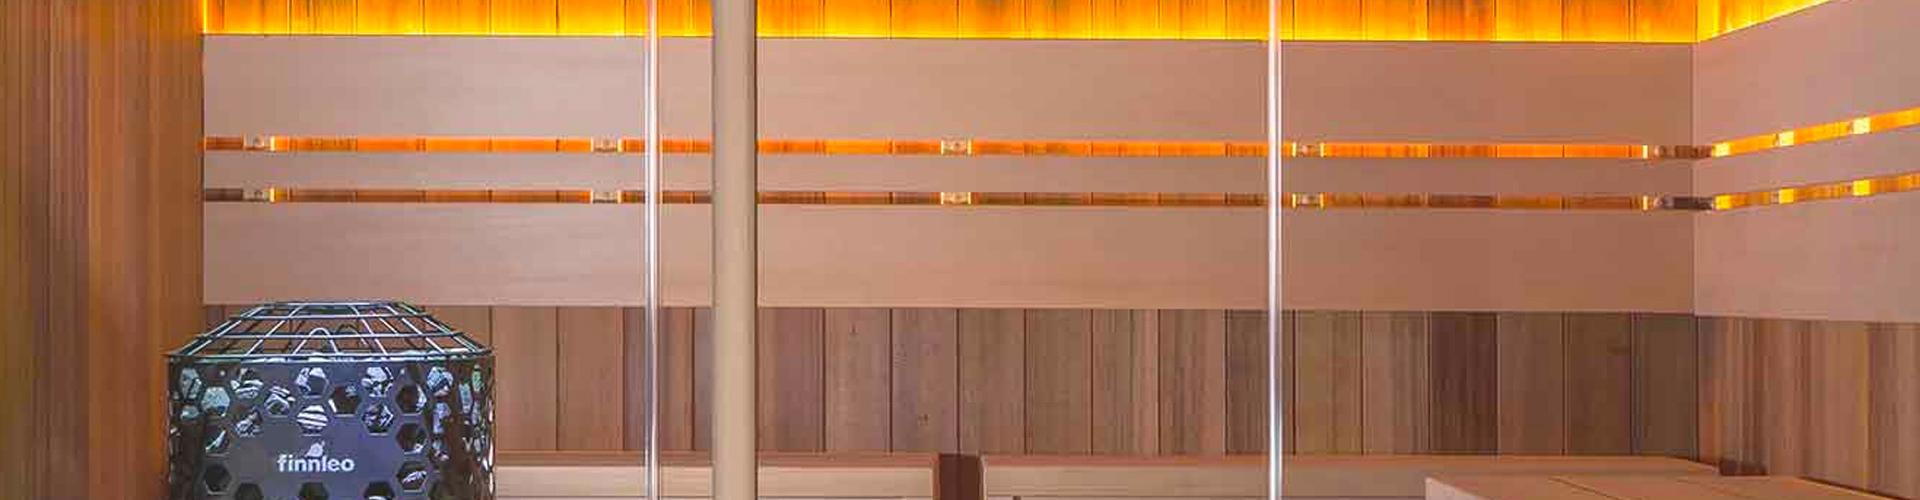 Can a Sauna Benefit My Health?